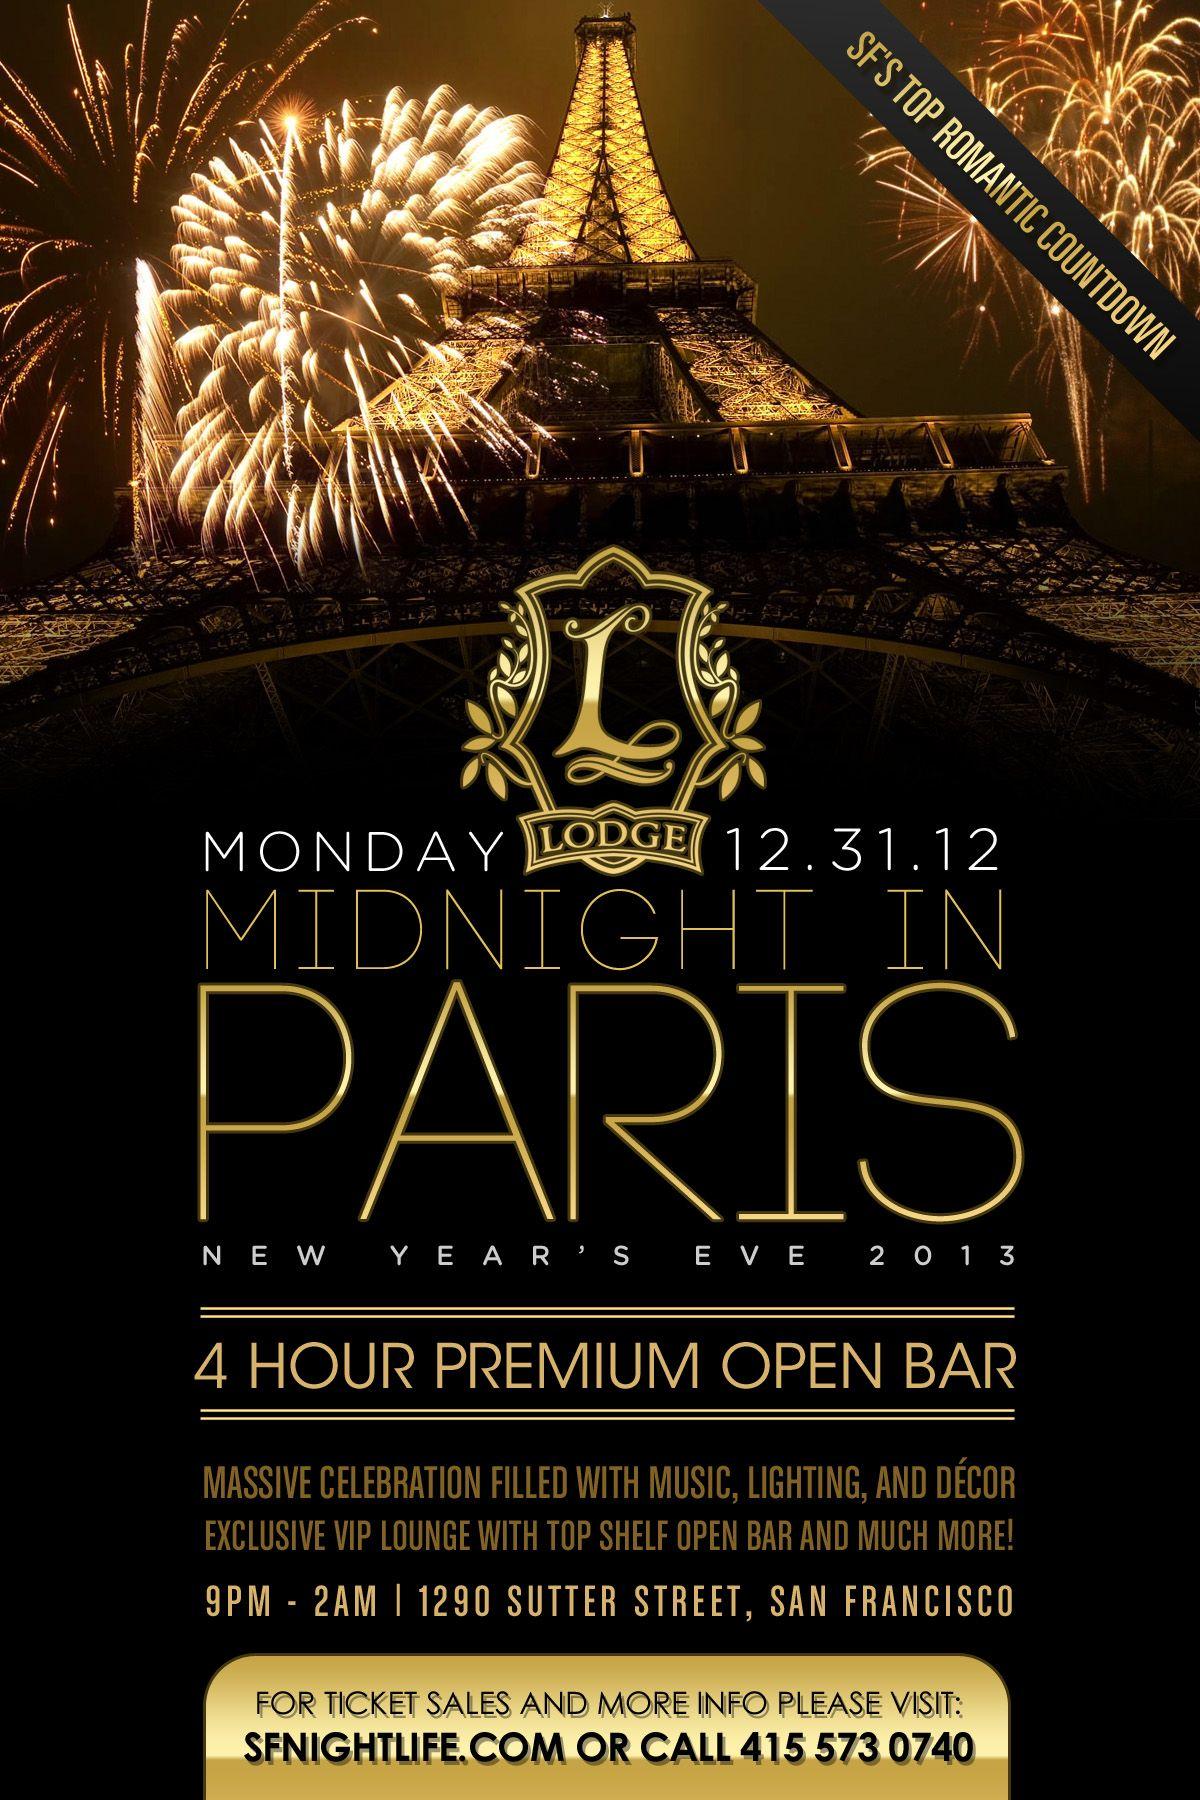 Midnight in Paris NYE 2013 - SF Tickets, San Francisco ...